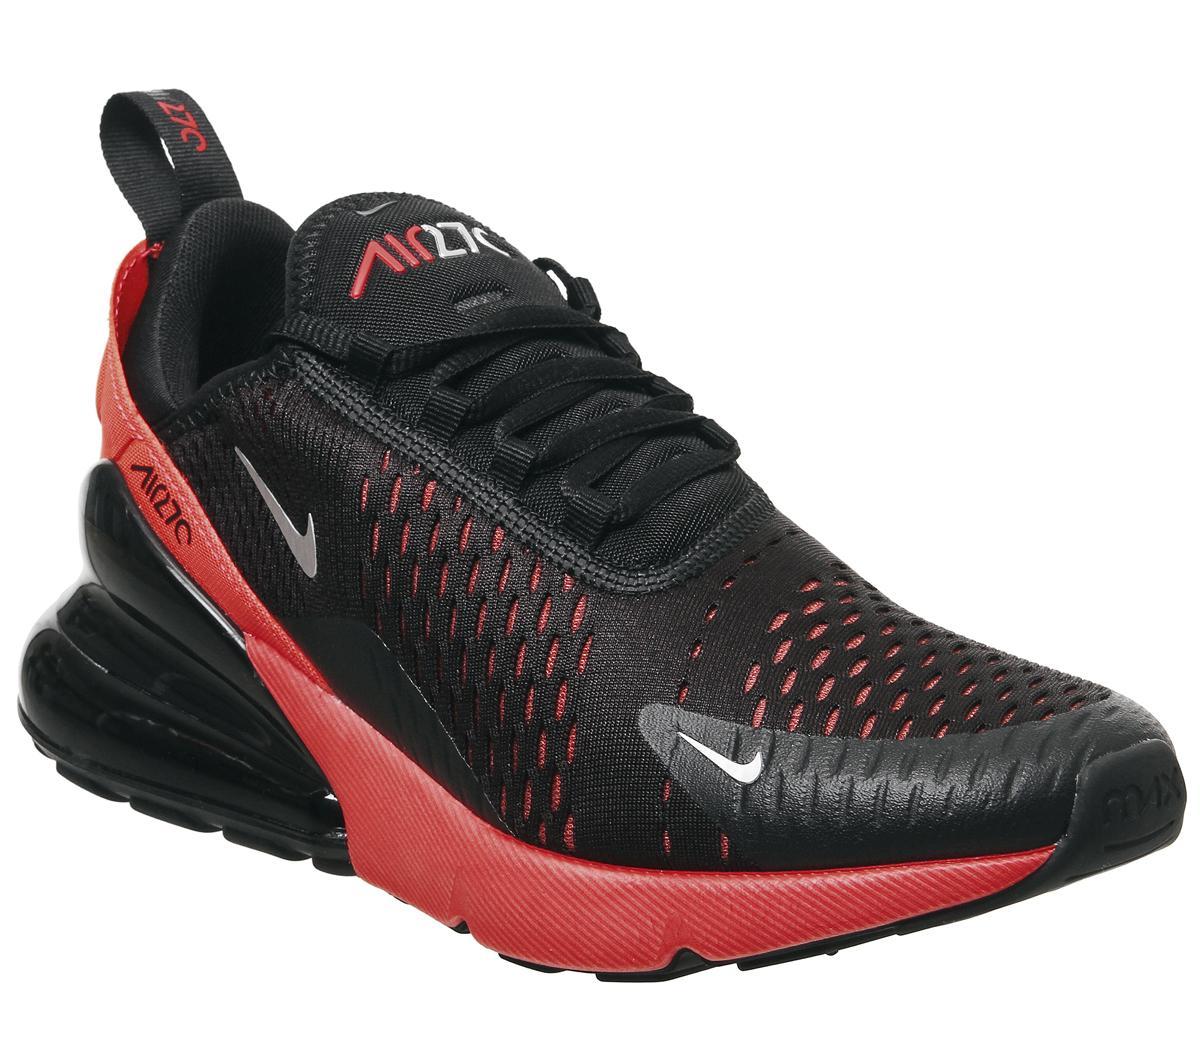 Nike Air Max 270 Fake VS Real,Nike Air Max 270 Sale Outlet